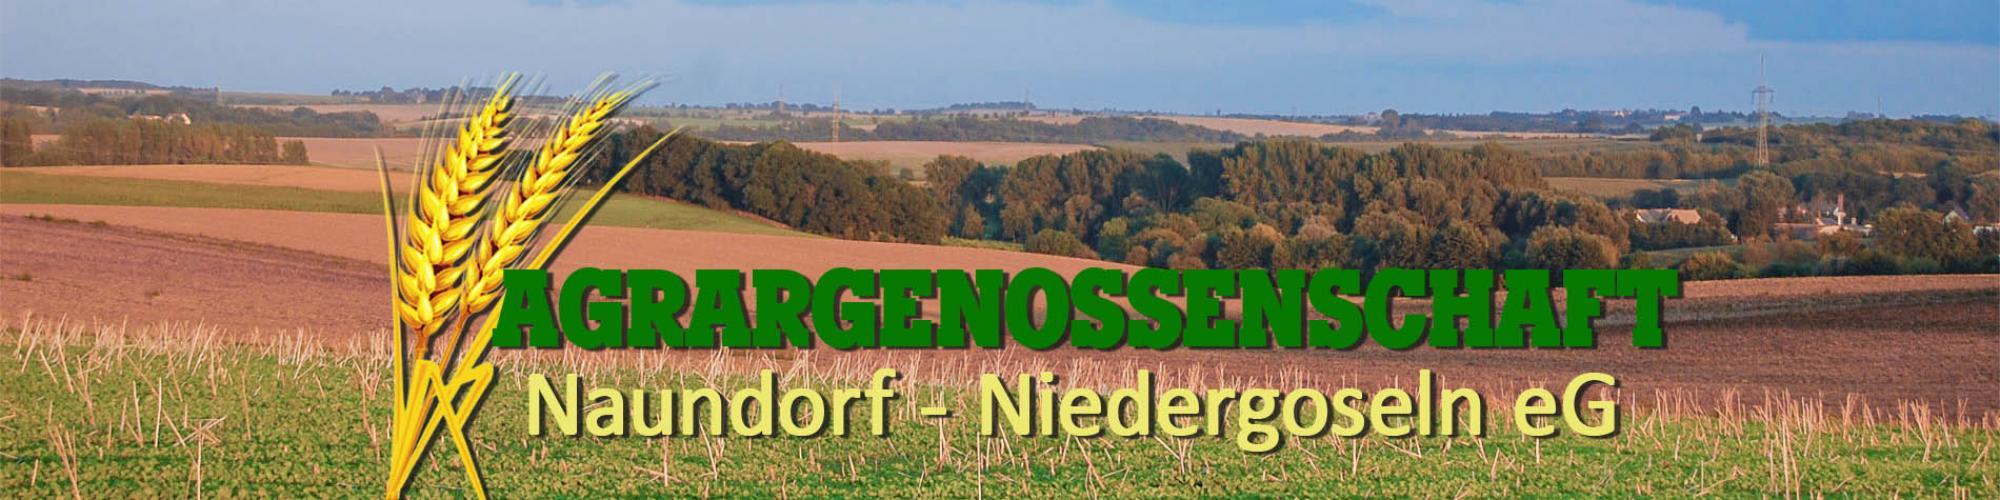 Agrargenossenschaft Naundorf-Niedergoseln eG